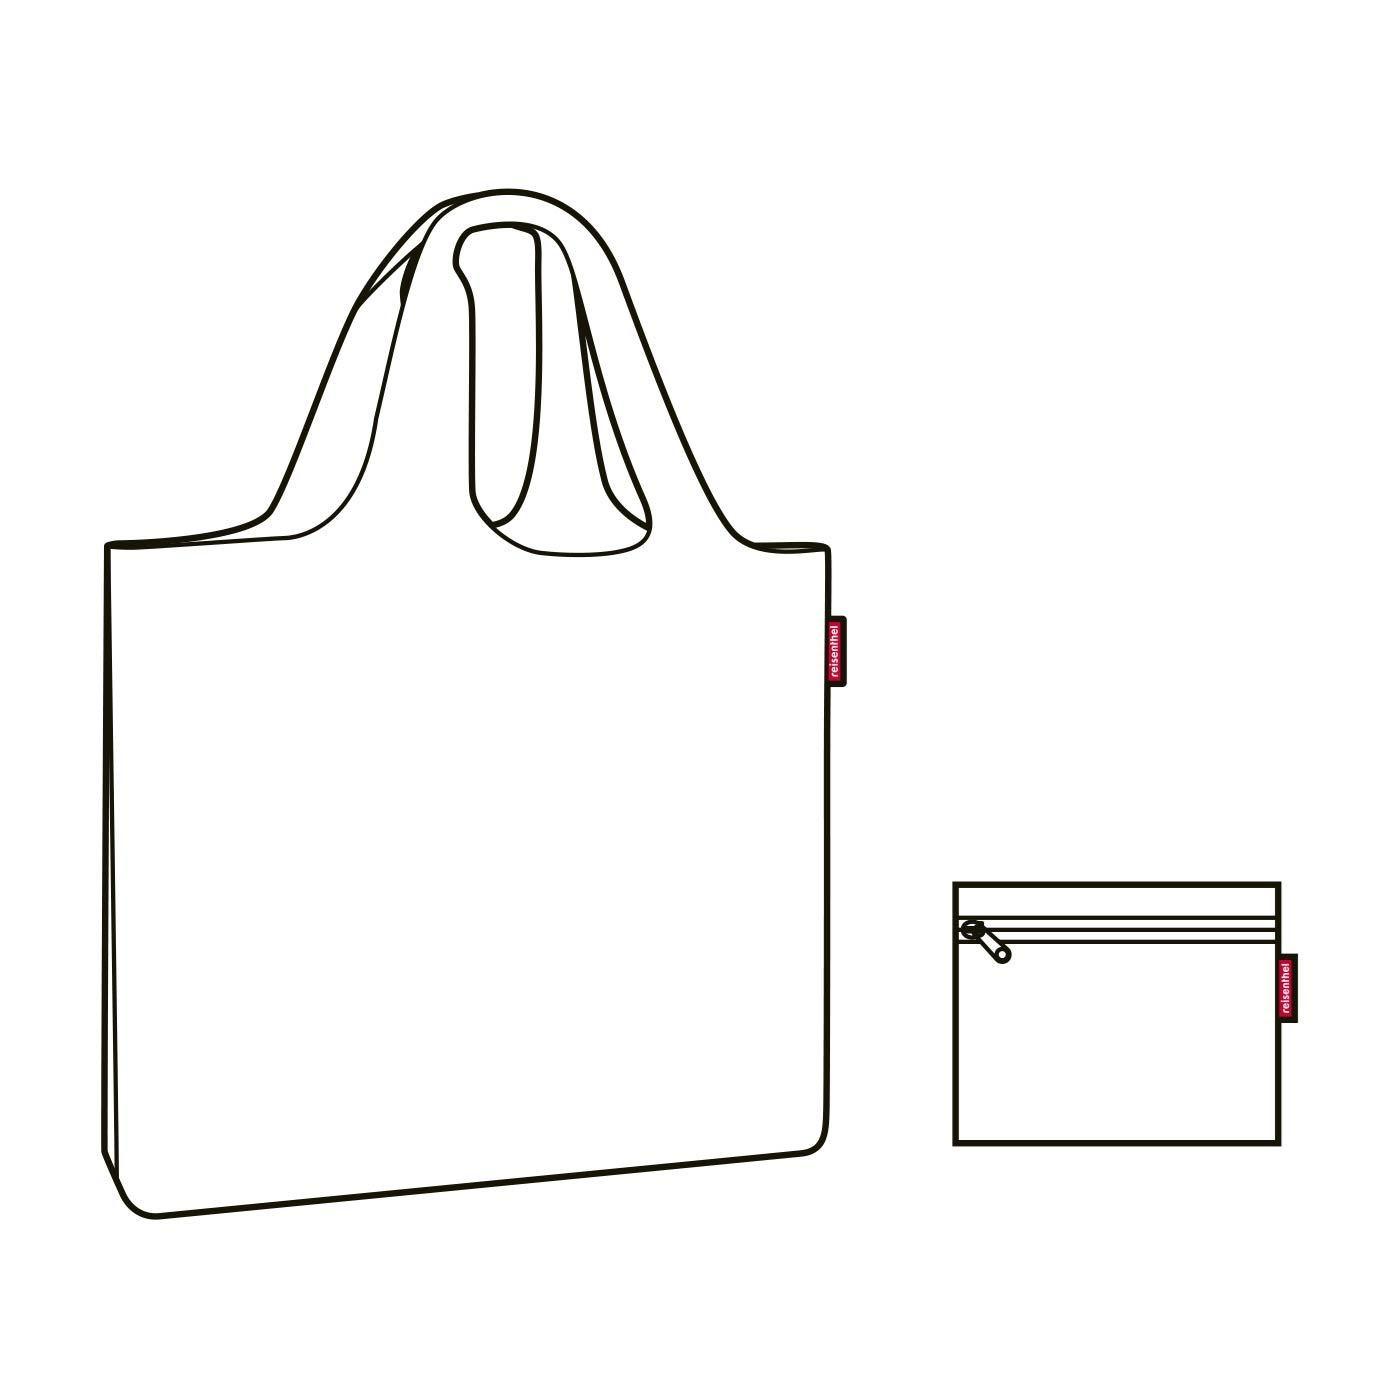 Skládací taška Mini Maxi Beachbag floral 1_2